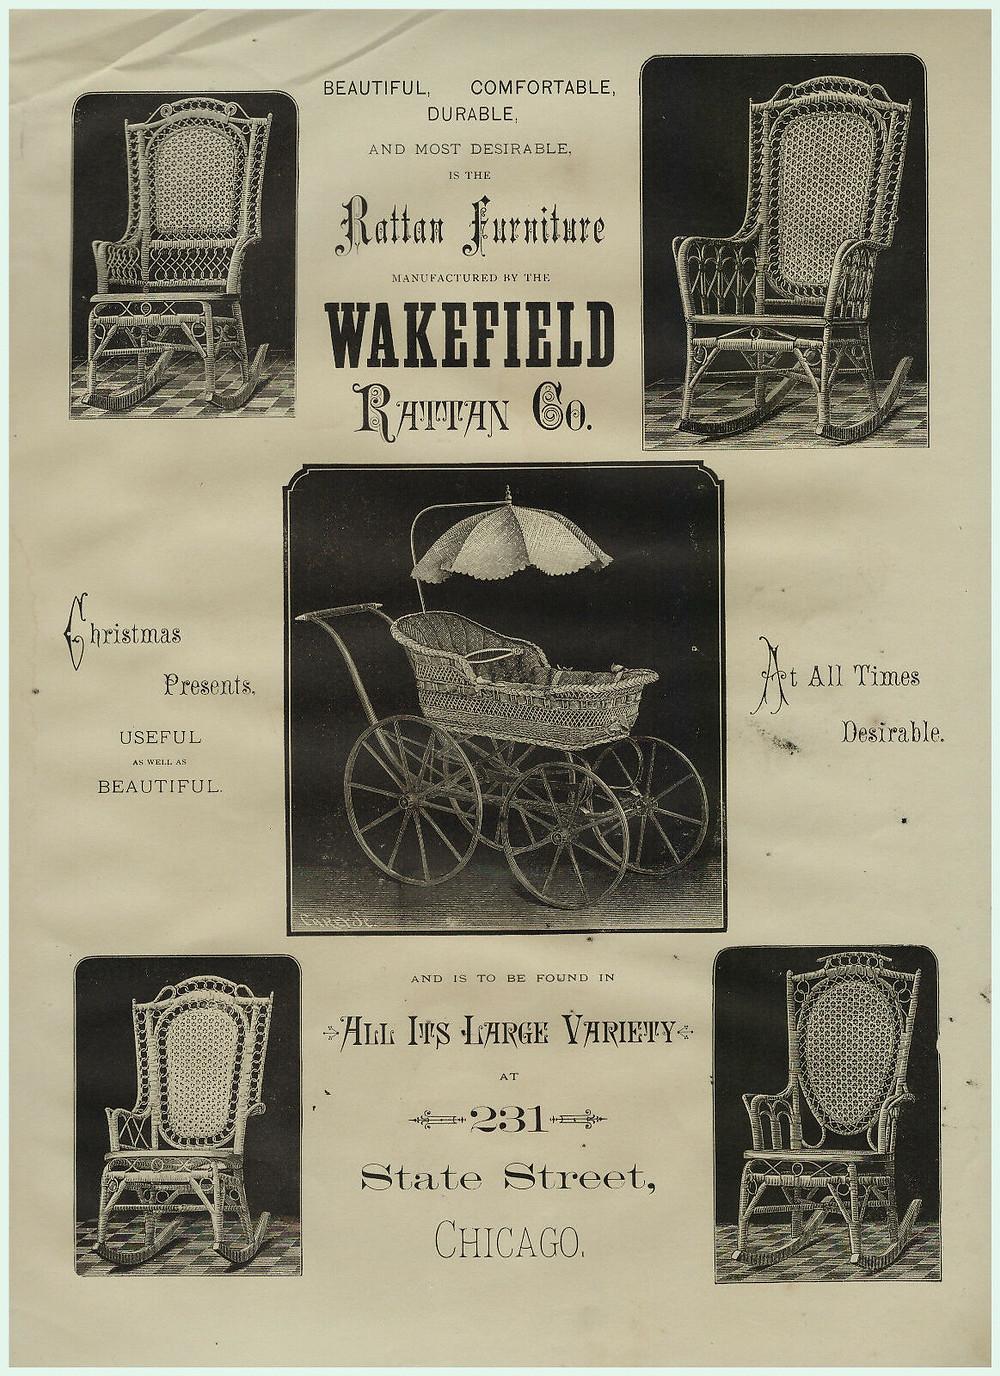 1897 Heywood Wakefield Wicker Ad